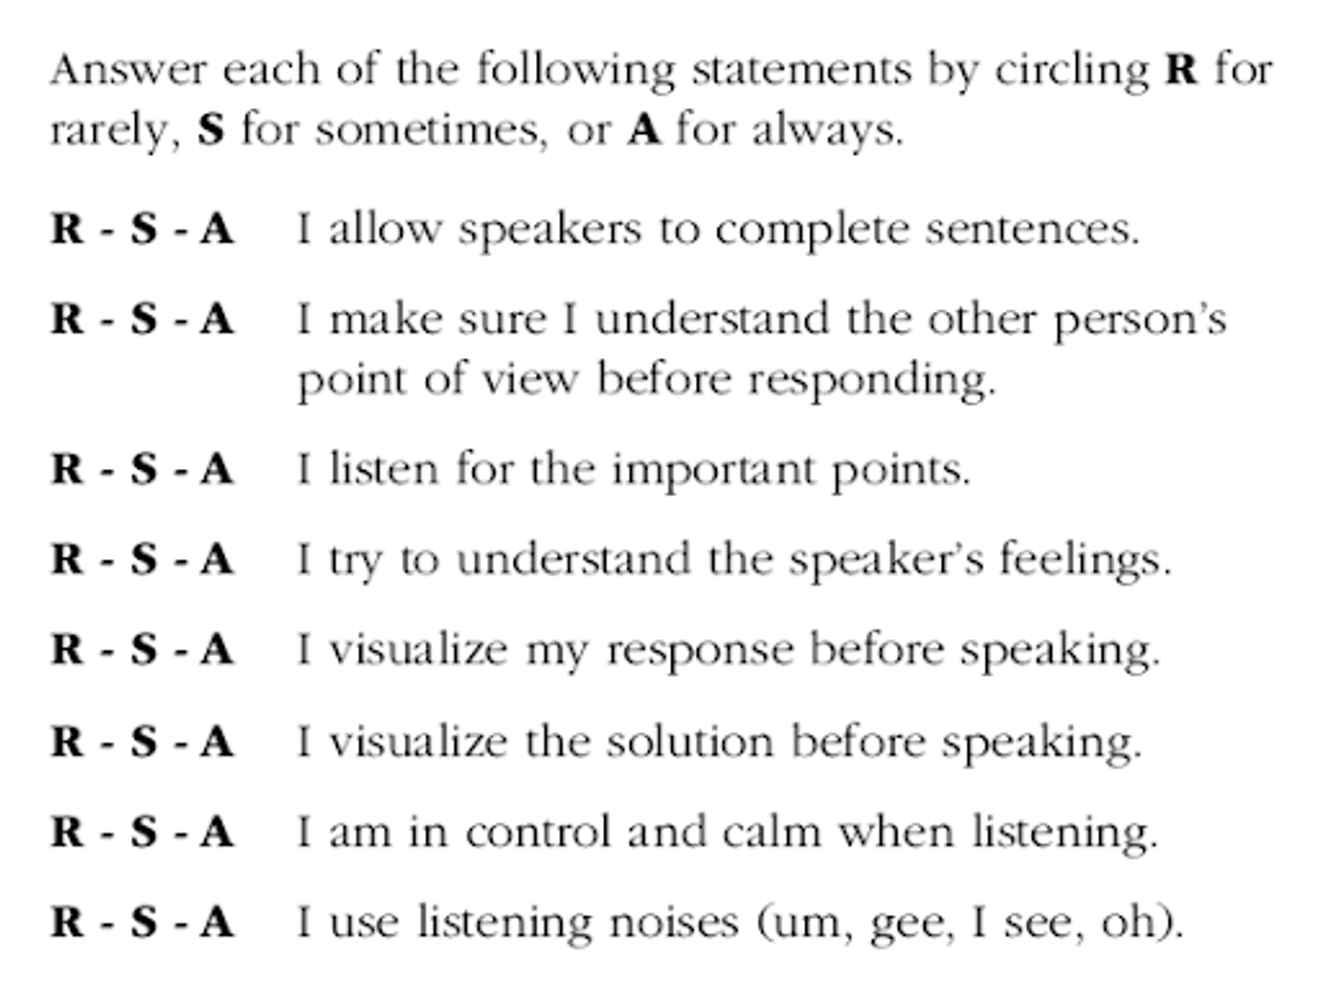 Jeffrey Gitomer, Listening survey